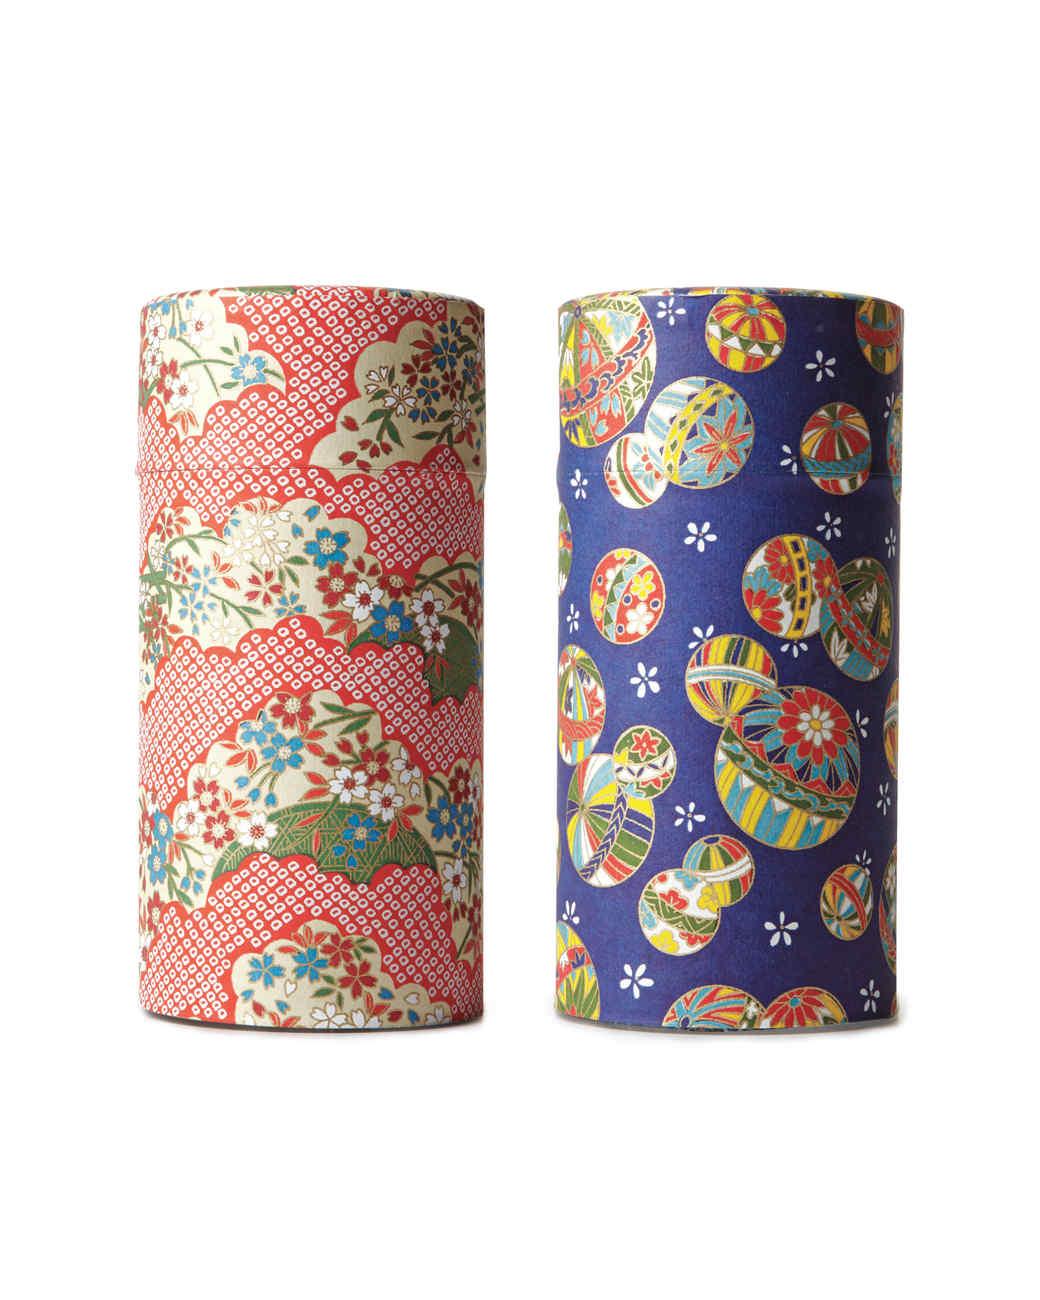 japanese-tea-canisters-mld108769.jpg